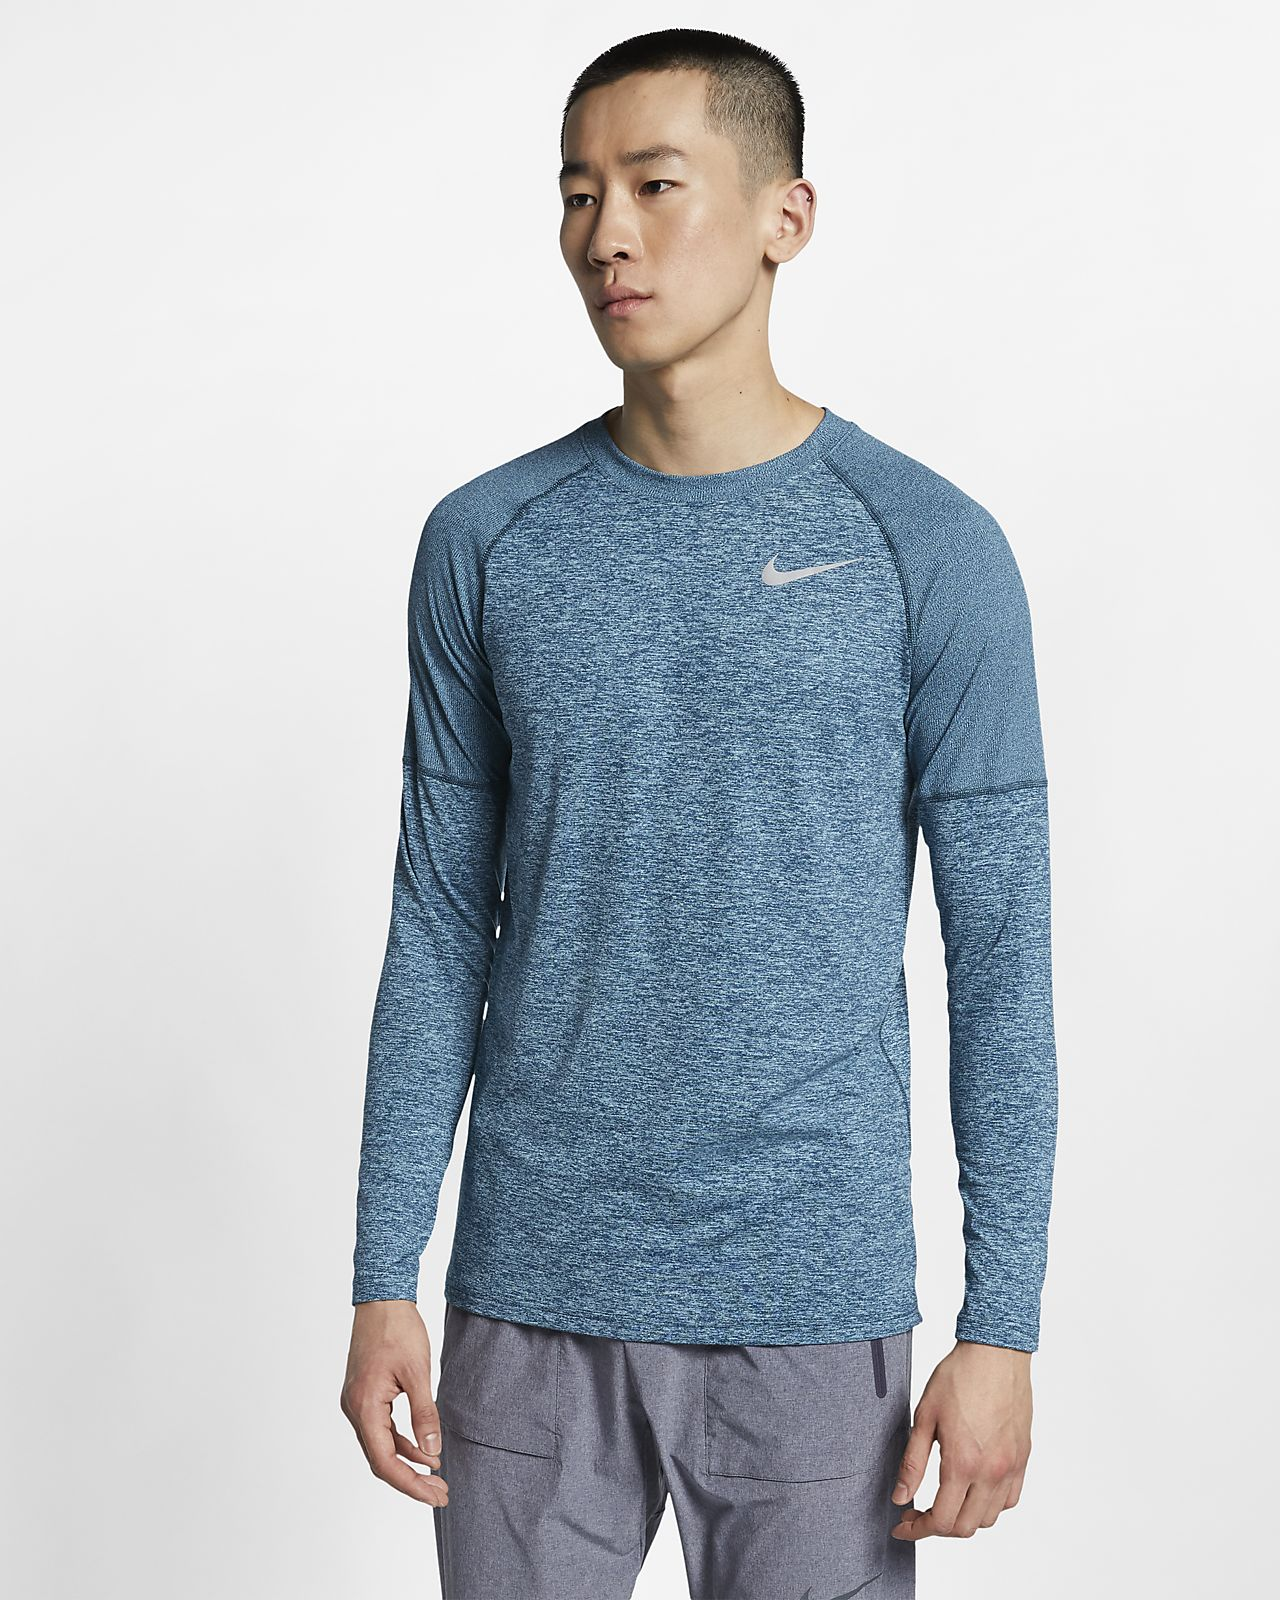 Maglia da running Nike - Uomo